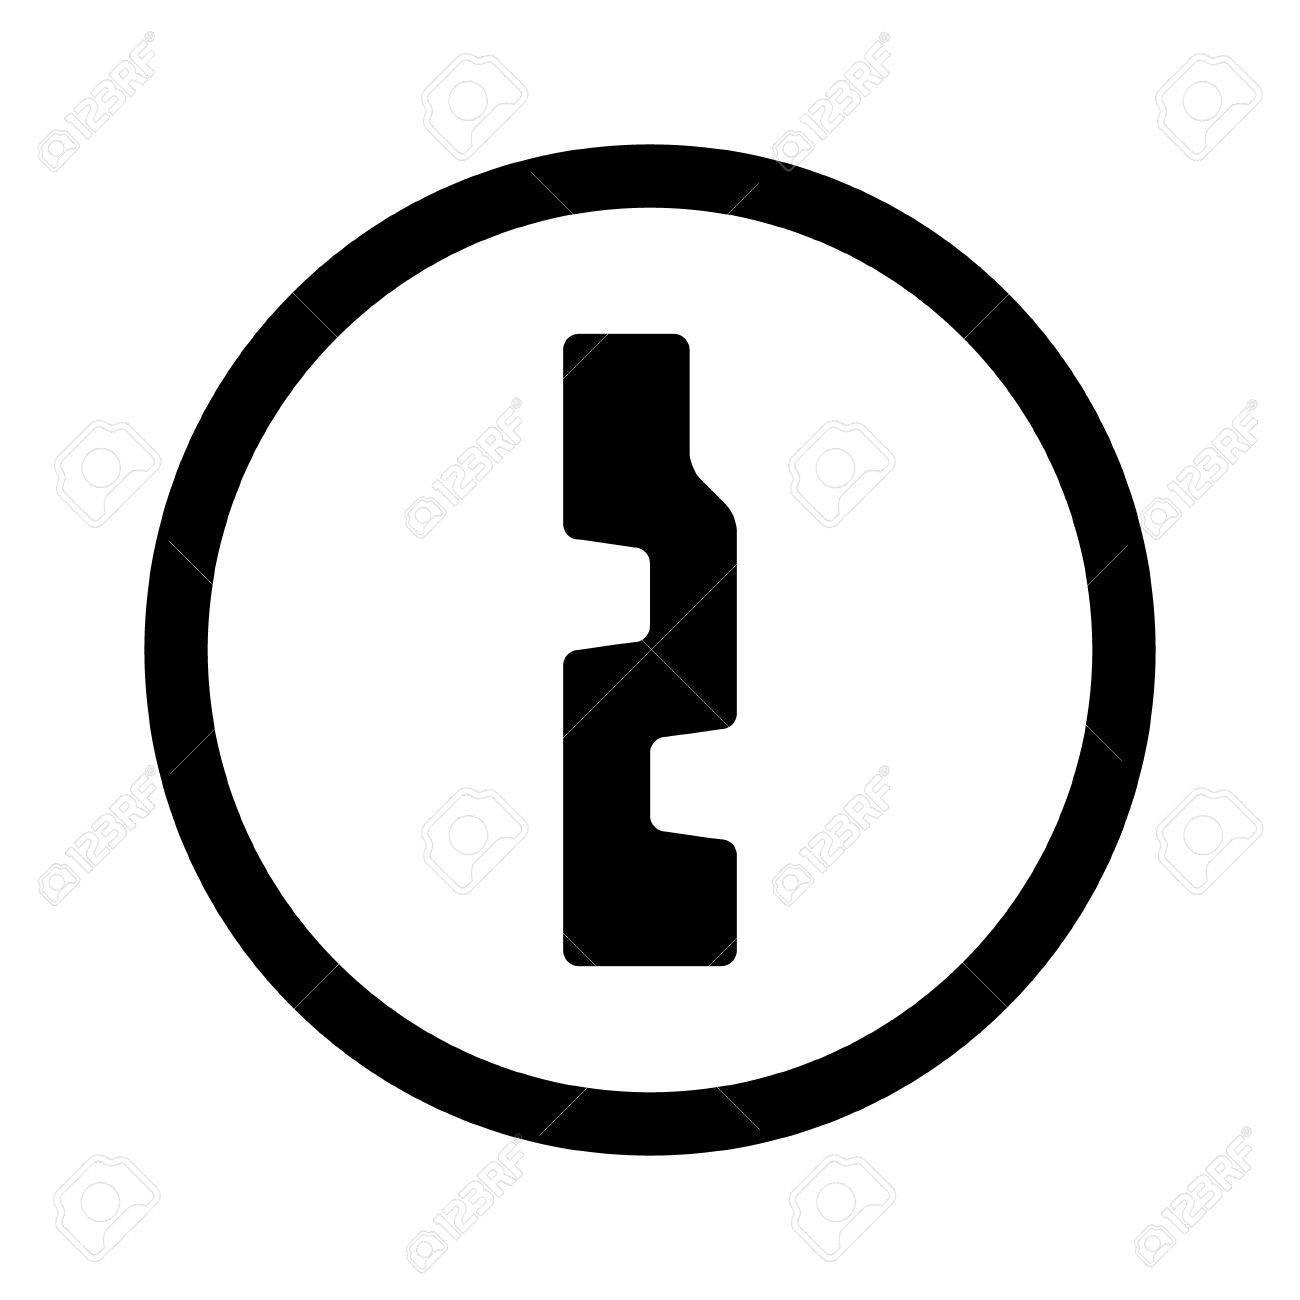 modern door keyhole access line art icon for apps and websites rh 123rf com vector keyhole keyhole vector icon